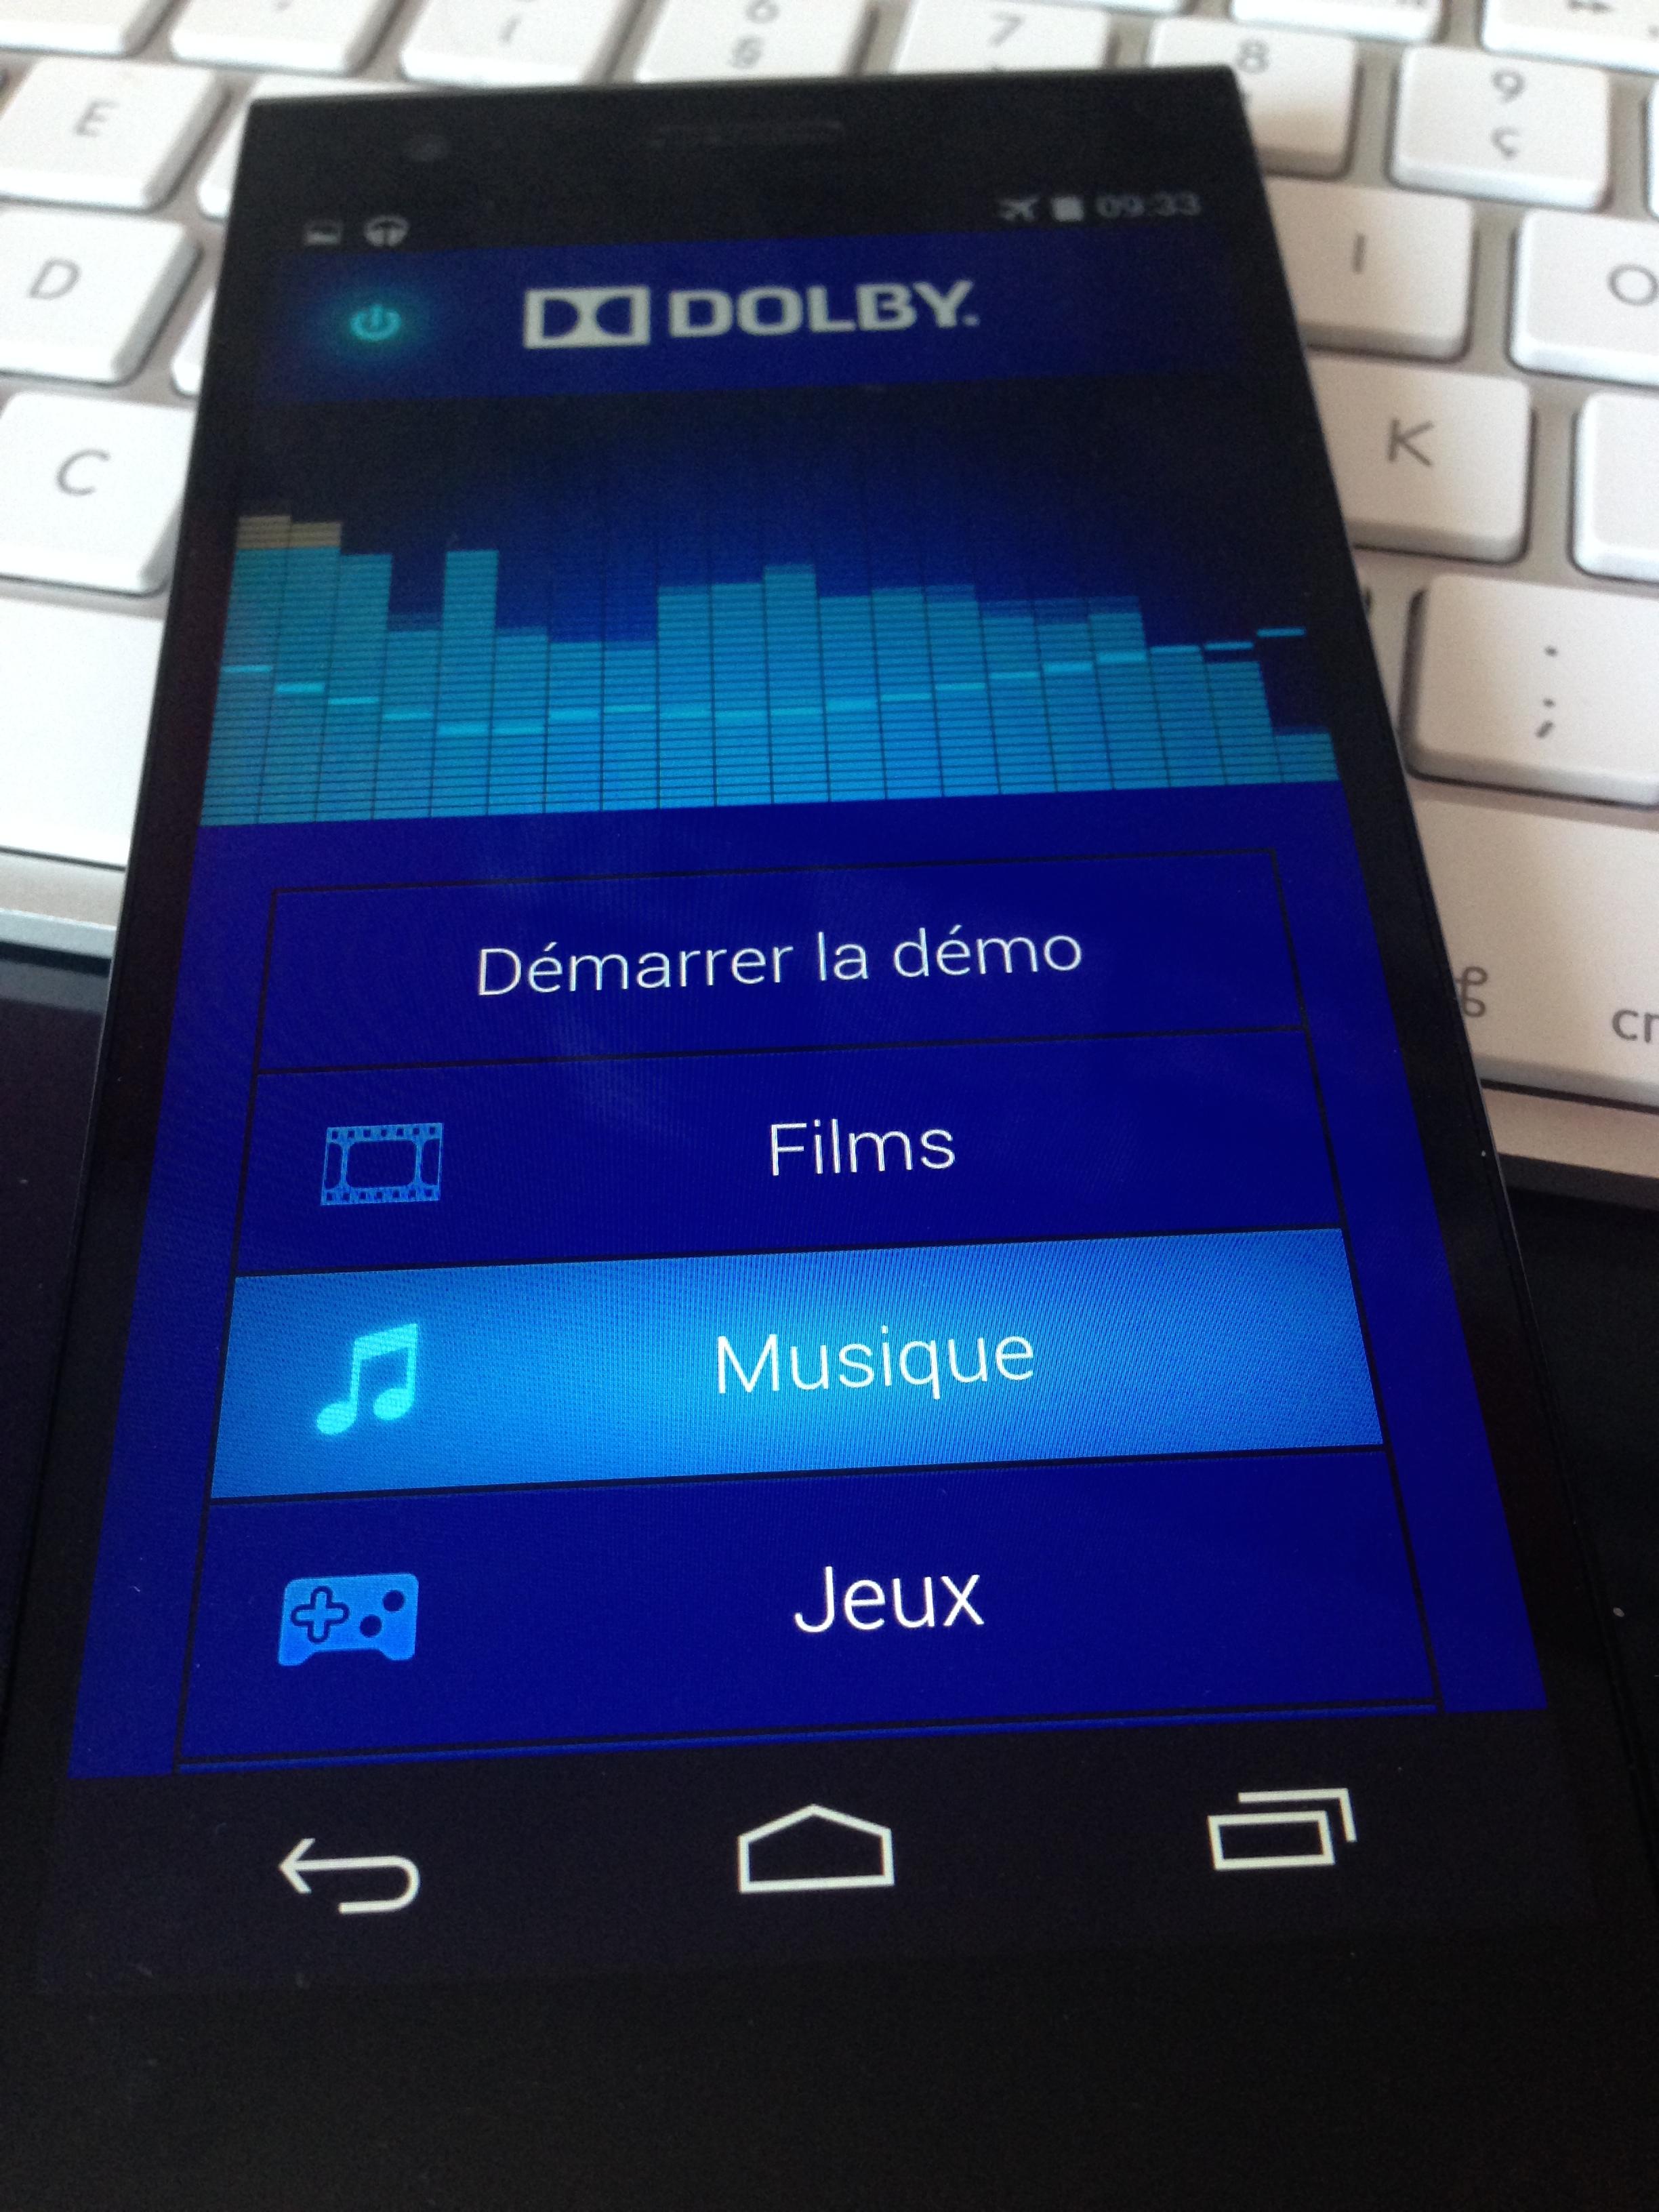 App Dolby